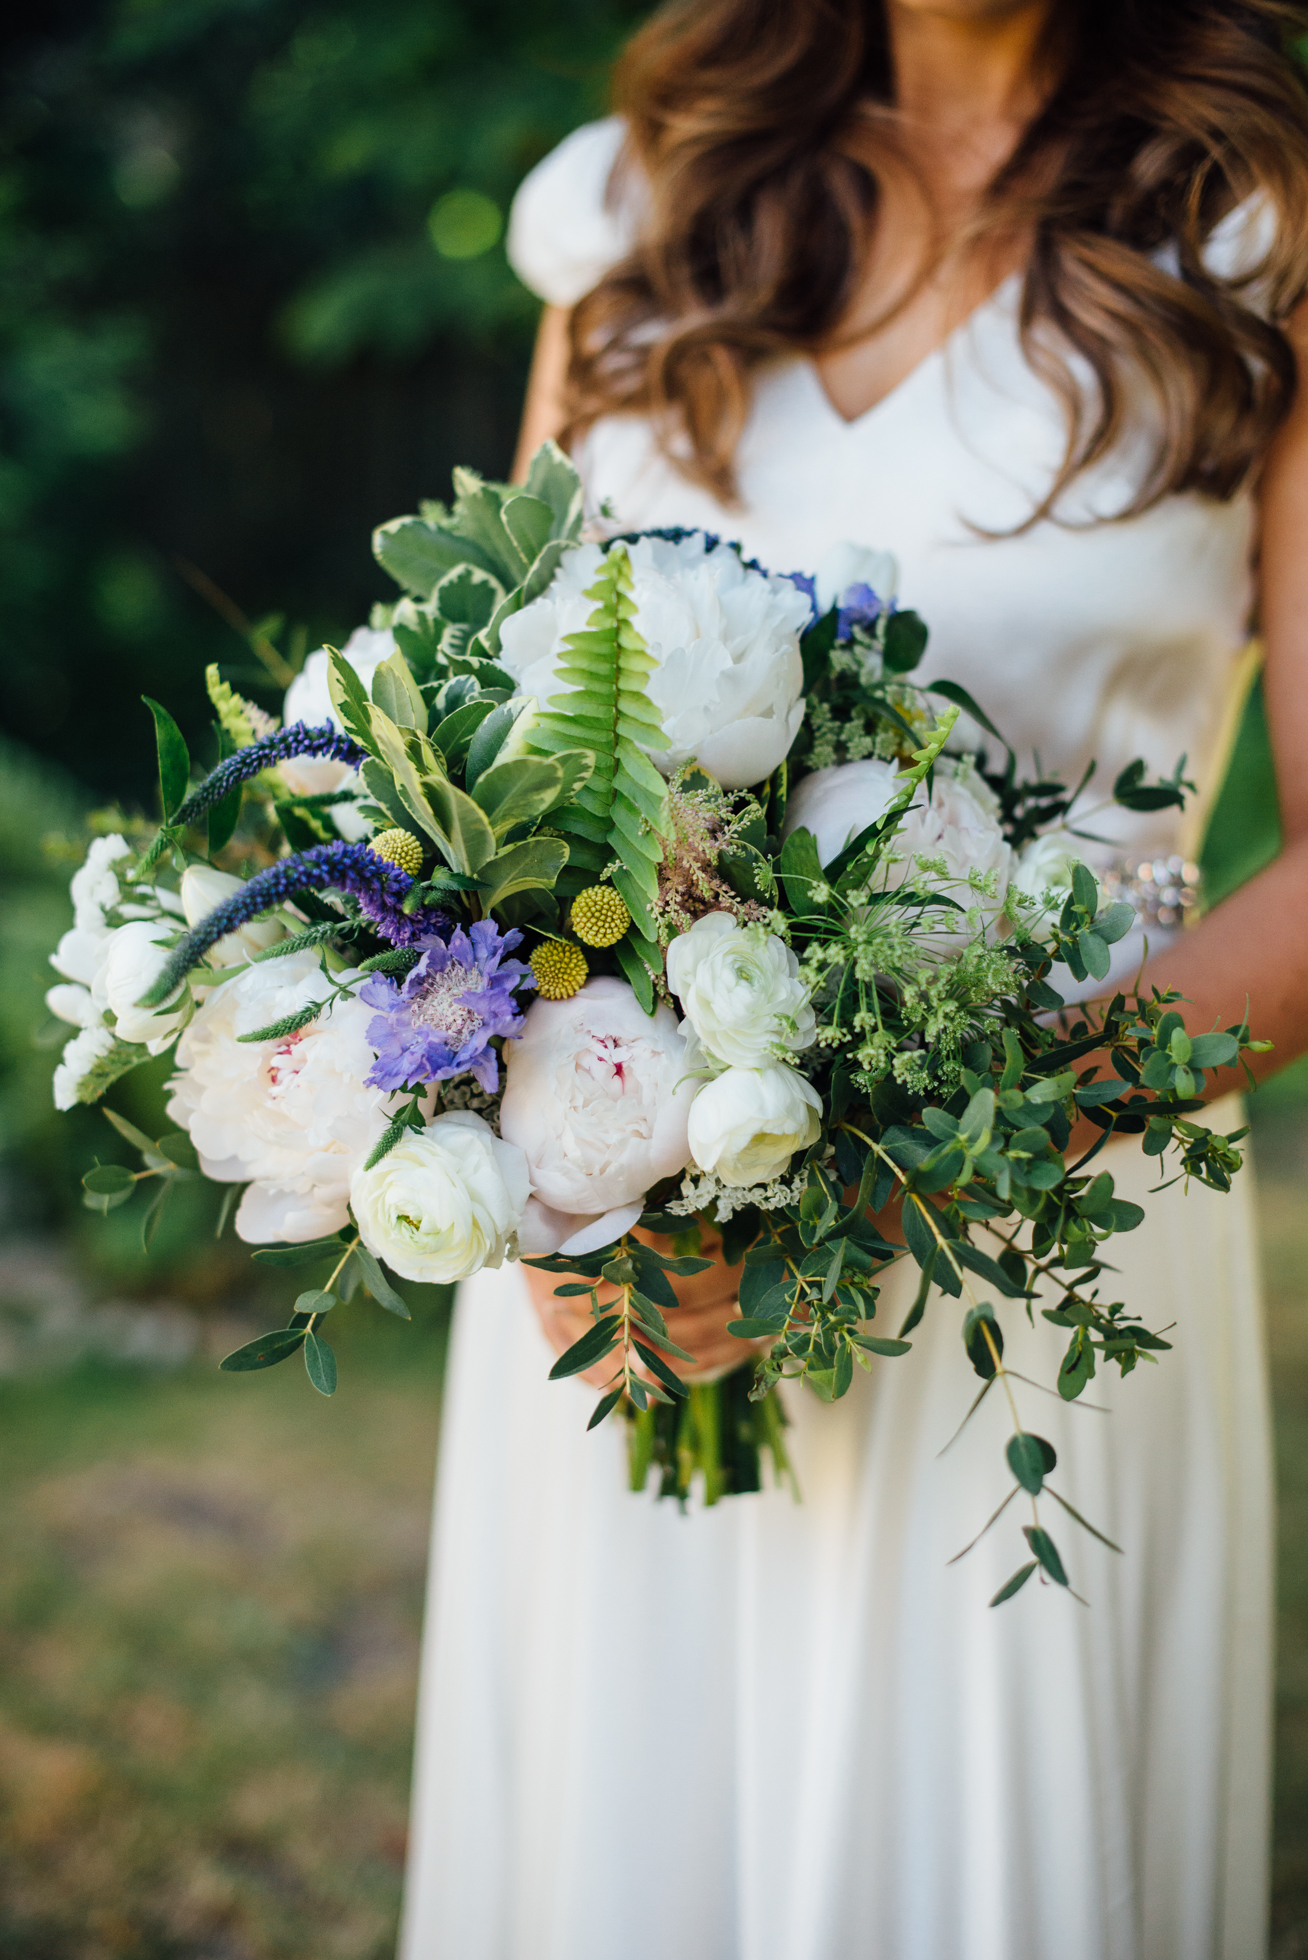 Downswell-Barn-Wedding-Photography-19.jpg